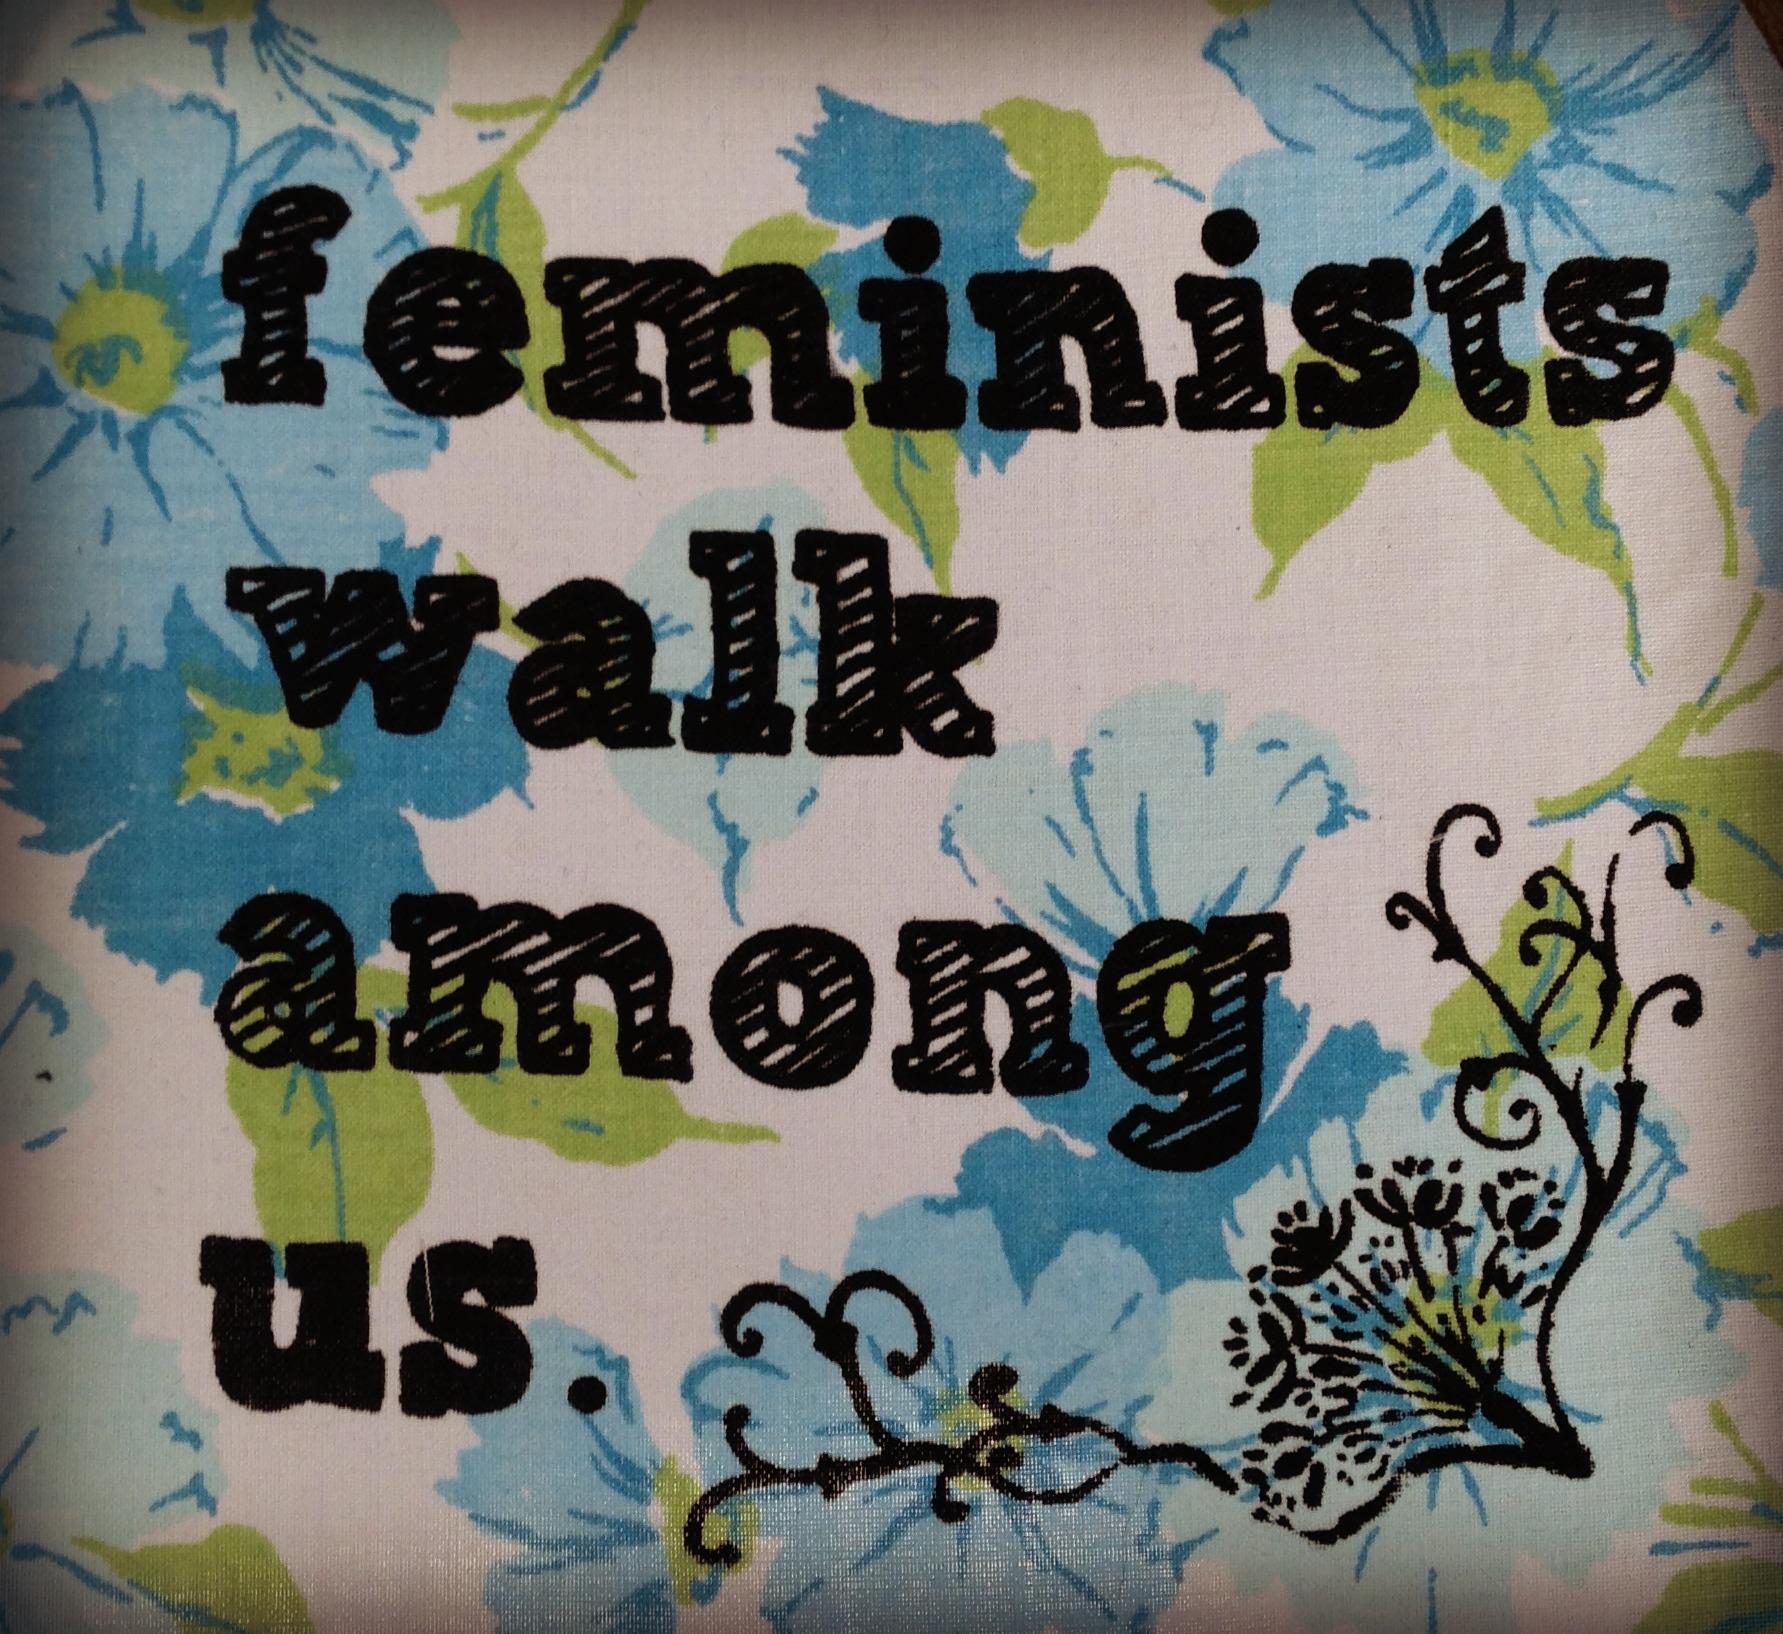 feministswalkamongus